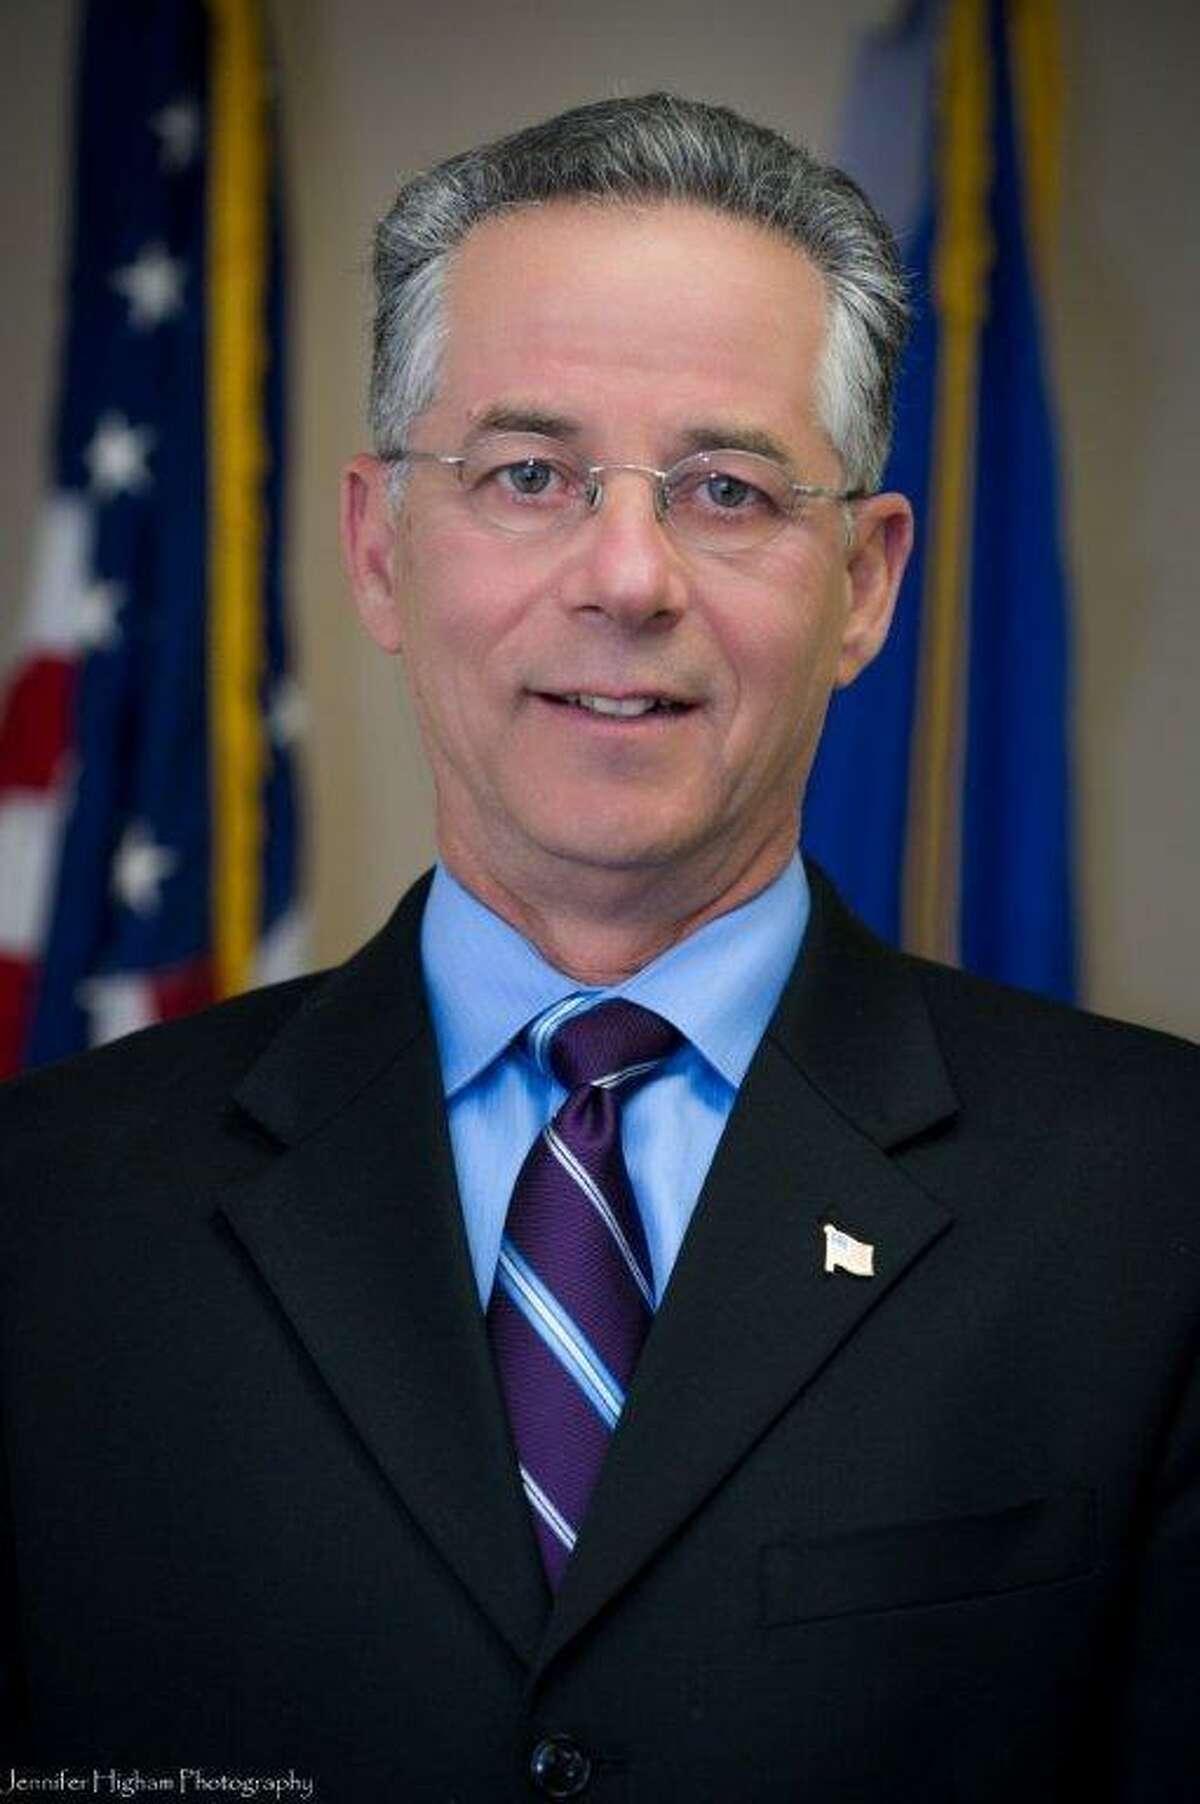 East Haven Mayor Joseph Maturo Jr.